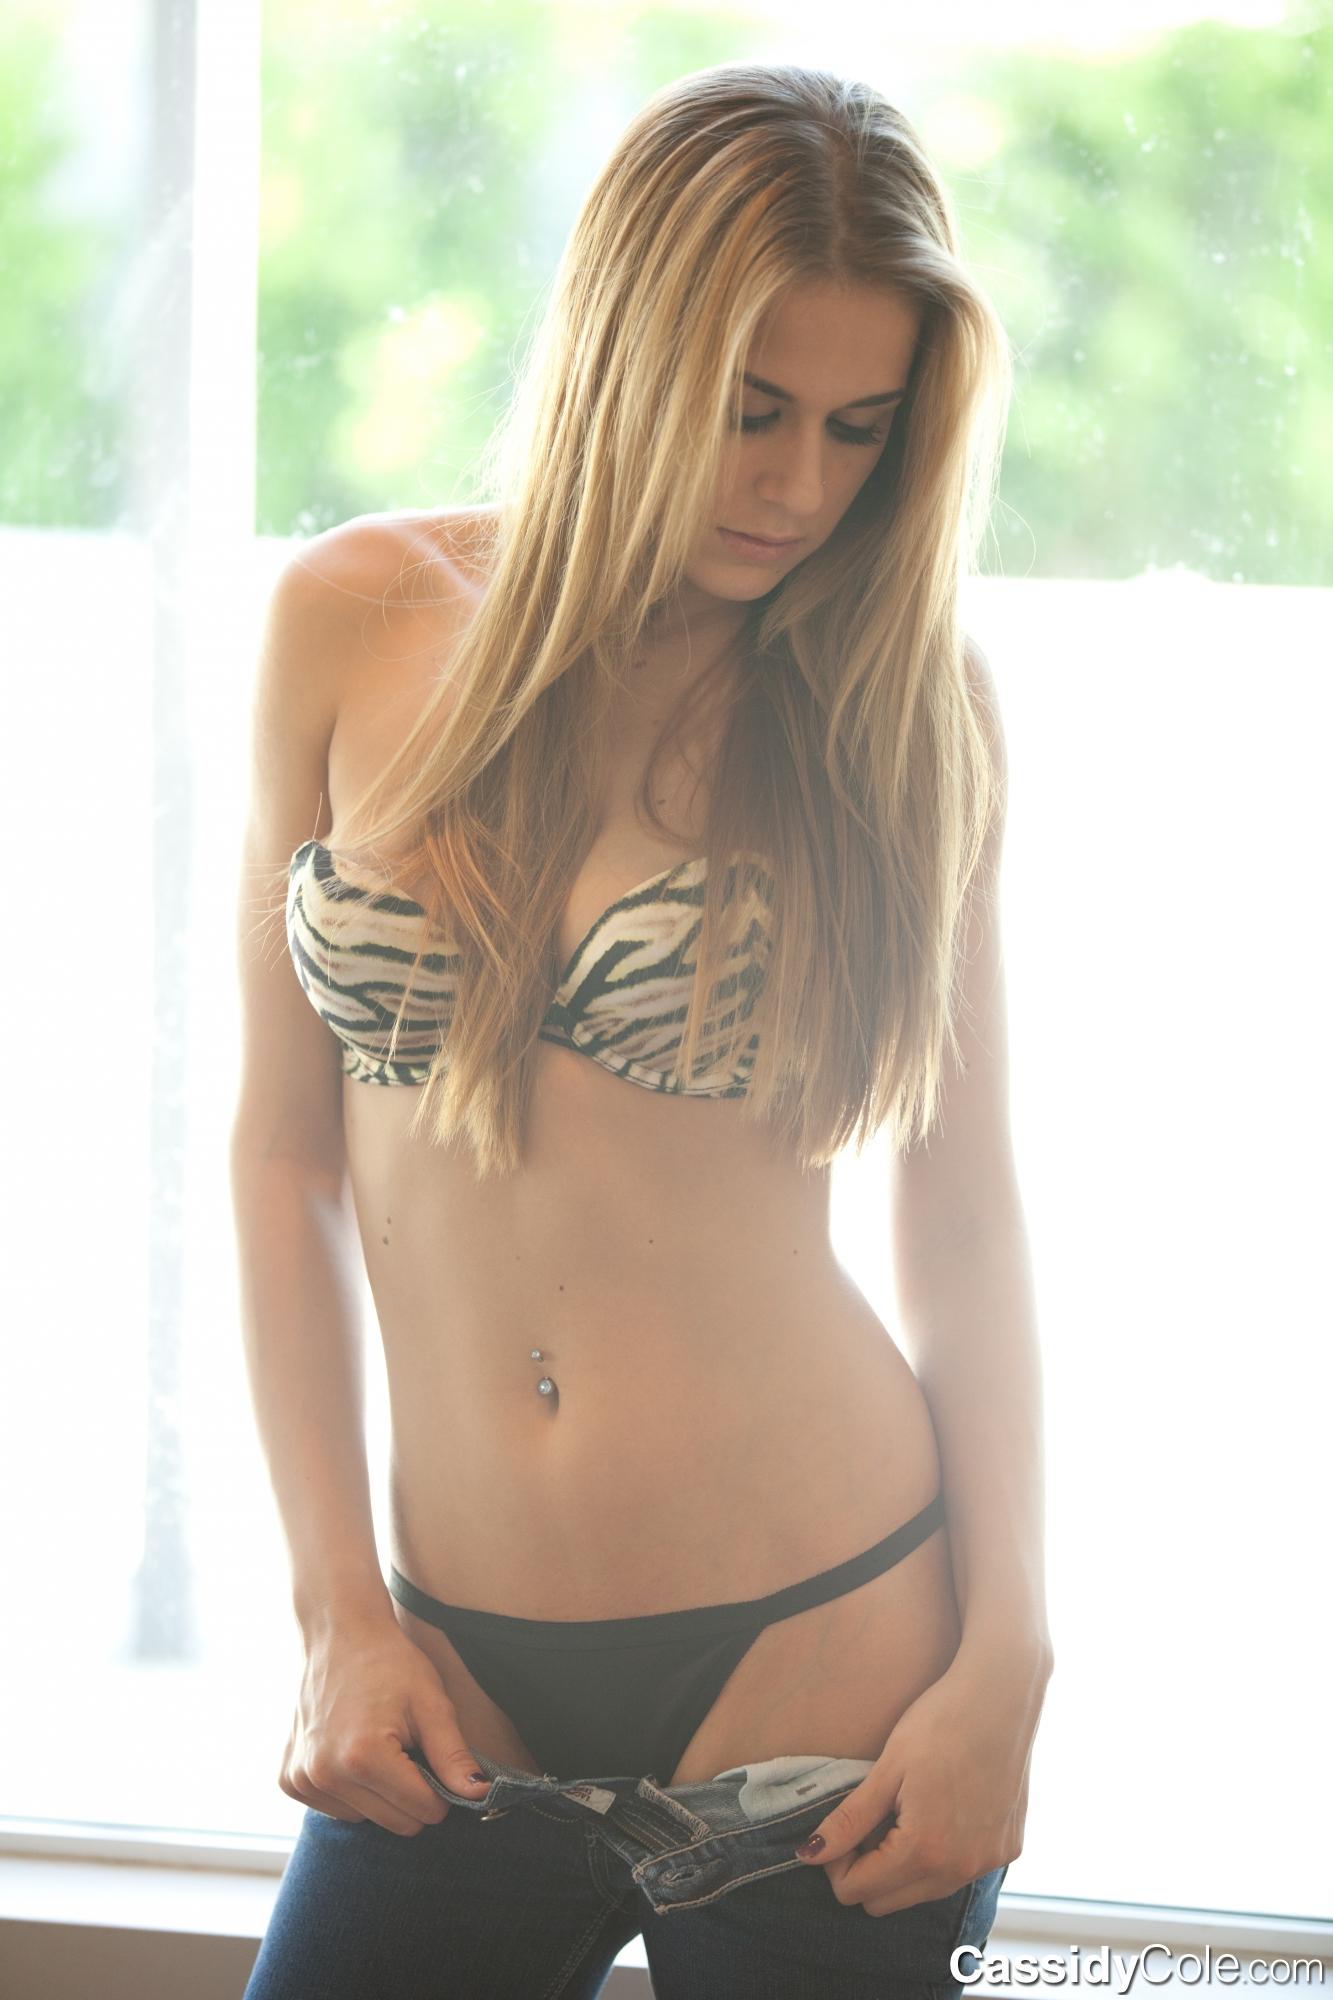 sexy ass nud